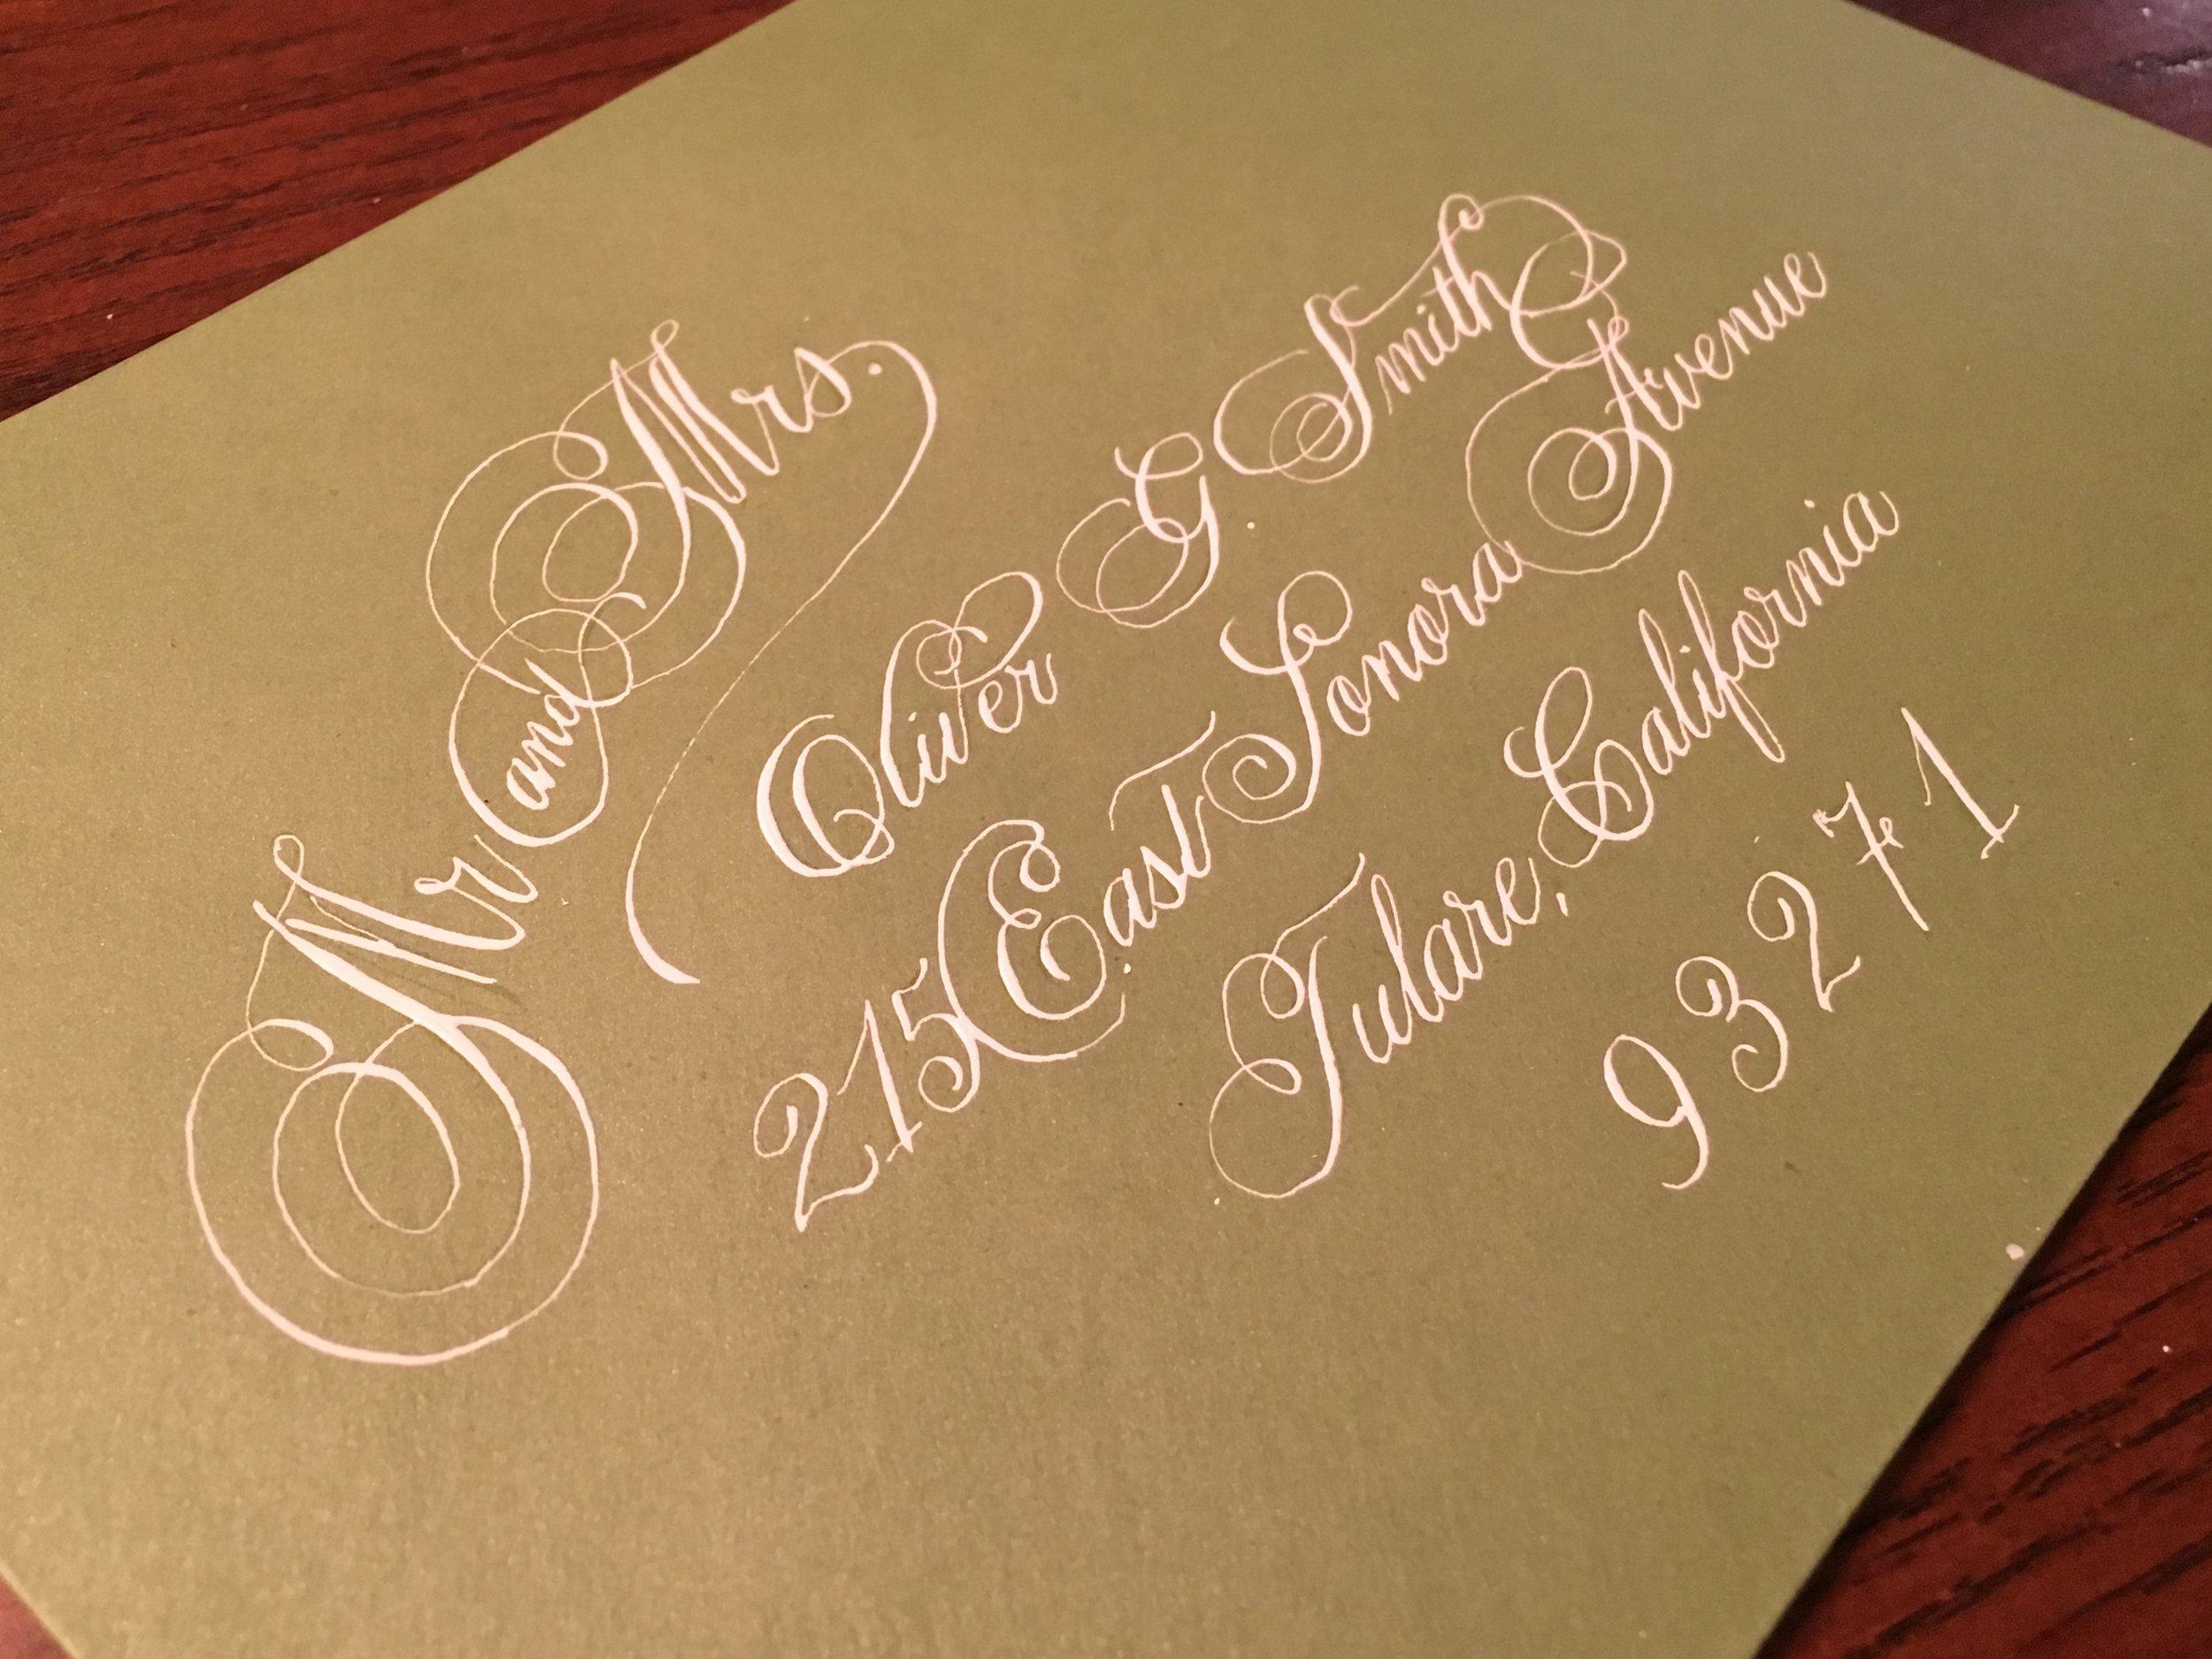 Central PA, hand lettering, Calligraphy, JesSmith Designs, custom invitations, wedding invitations, custom signage-01-30 20.43.18.jpg